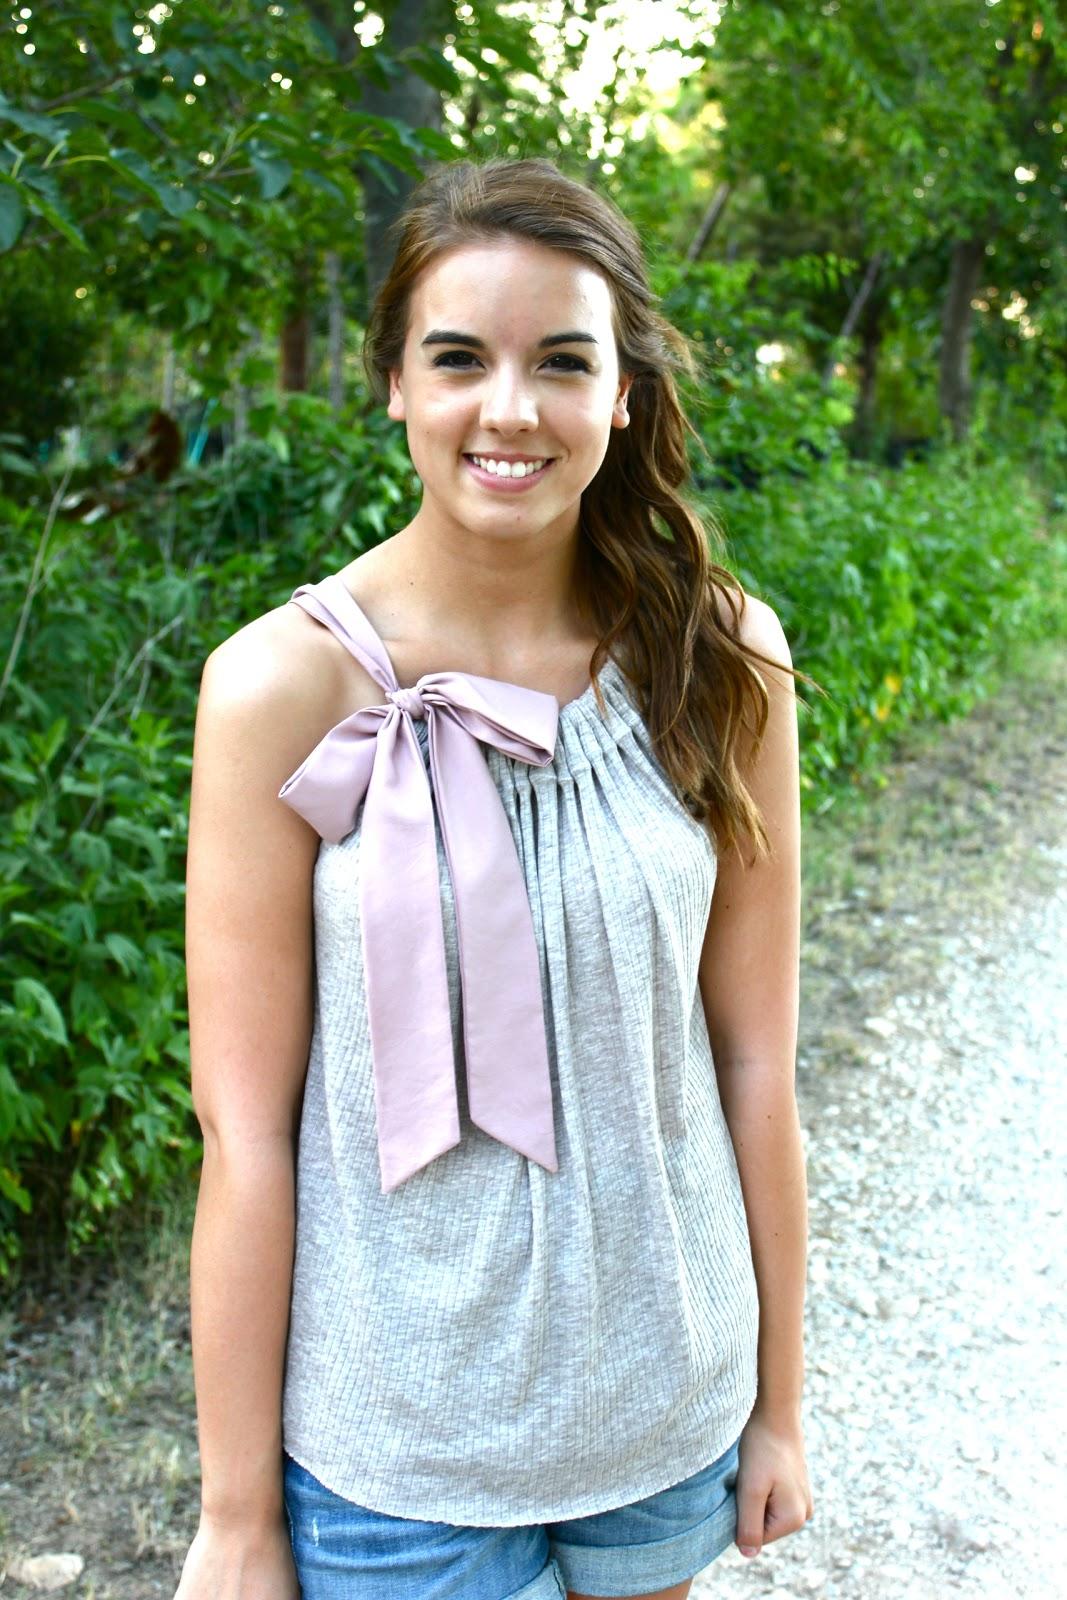 Feelin' Crafty: DIY Simple Bow Shirt